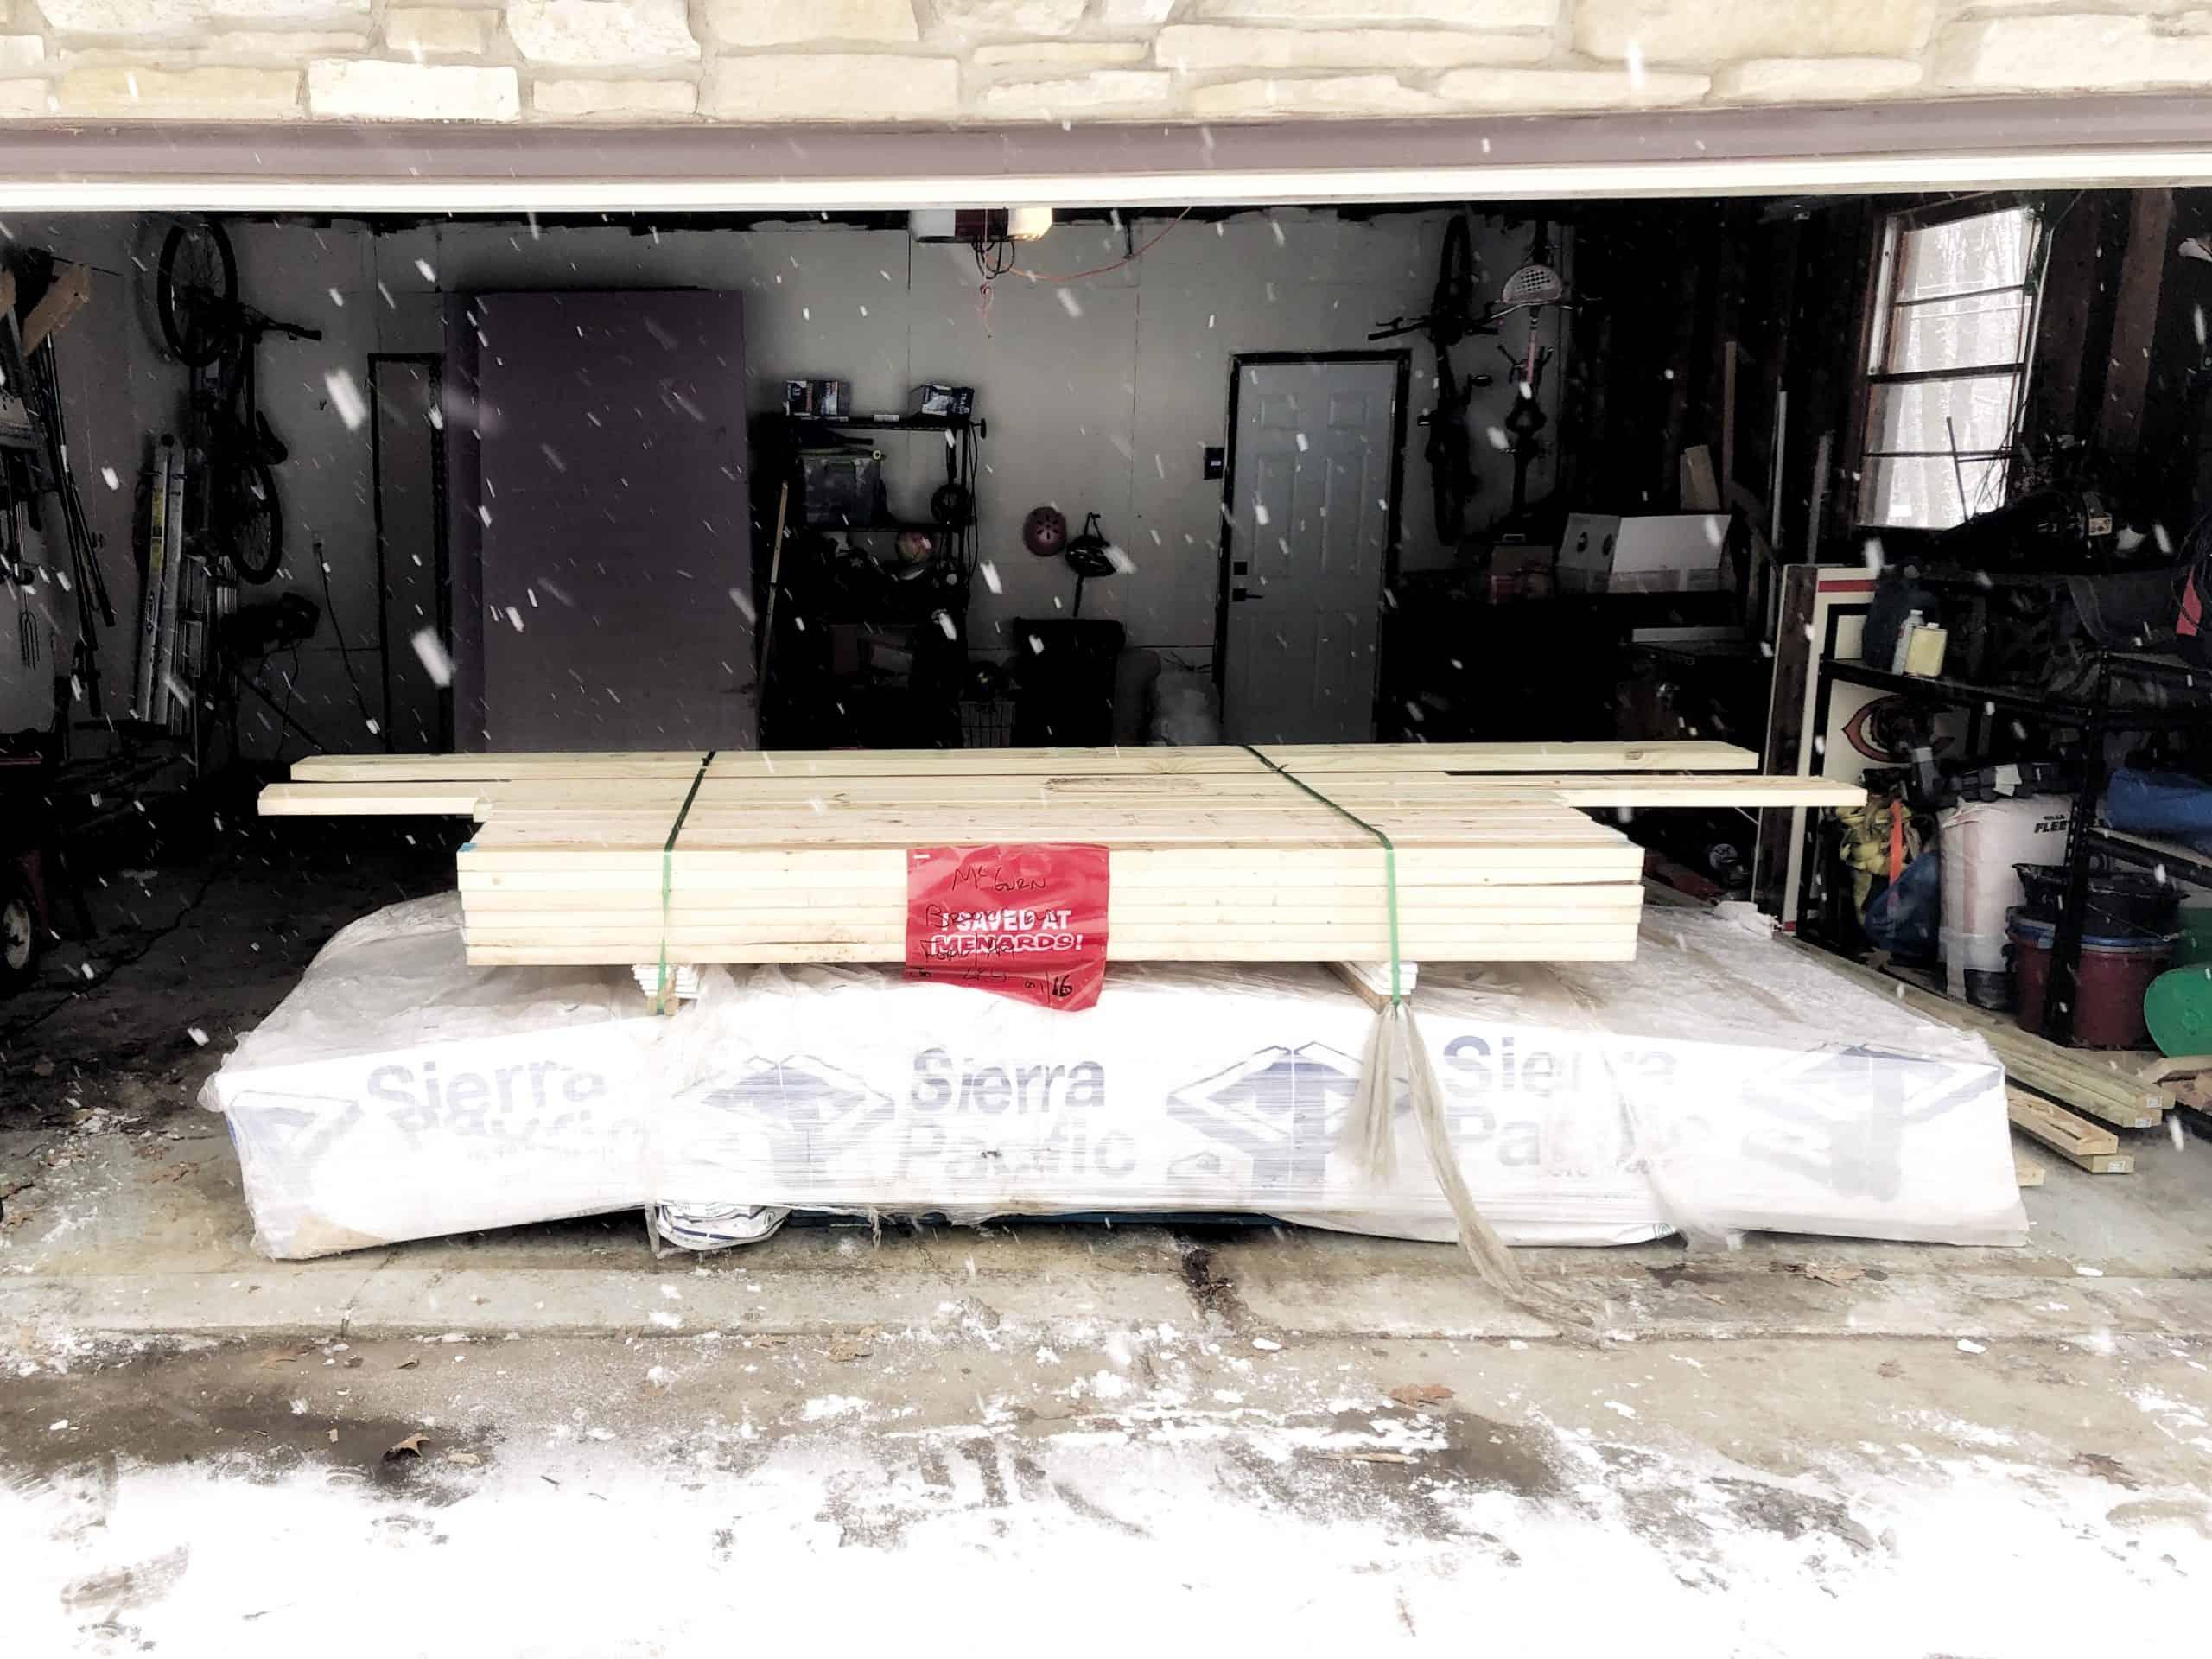 Menards Supply Delivery